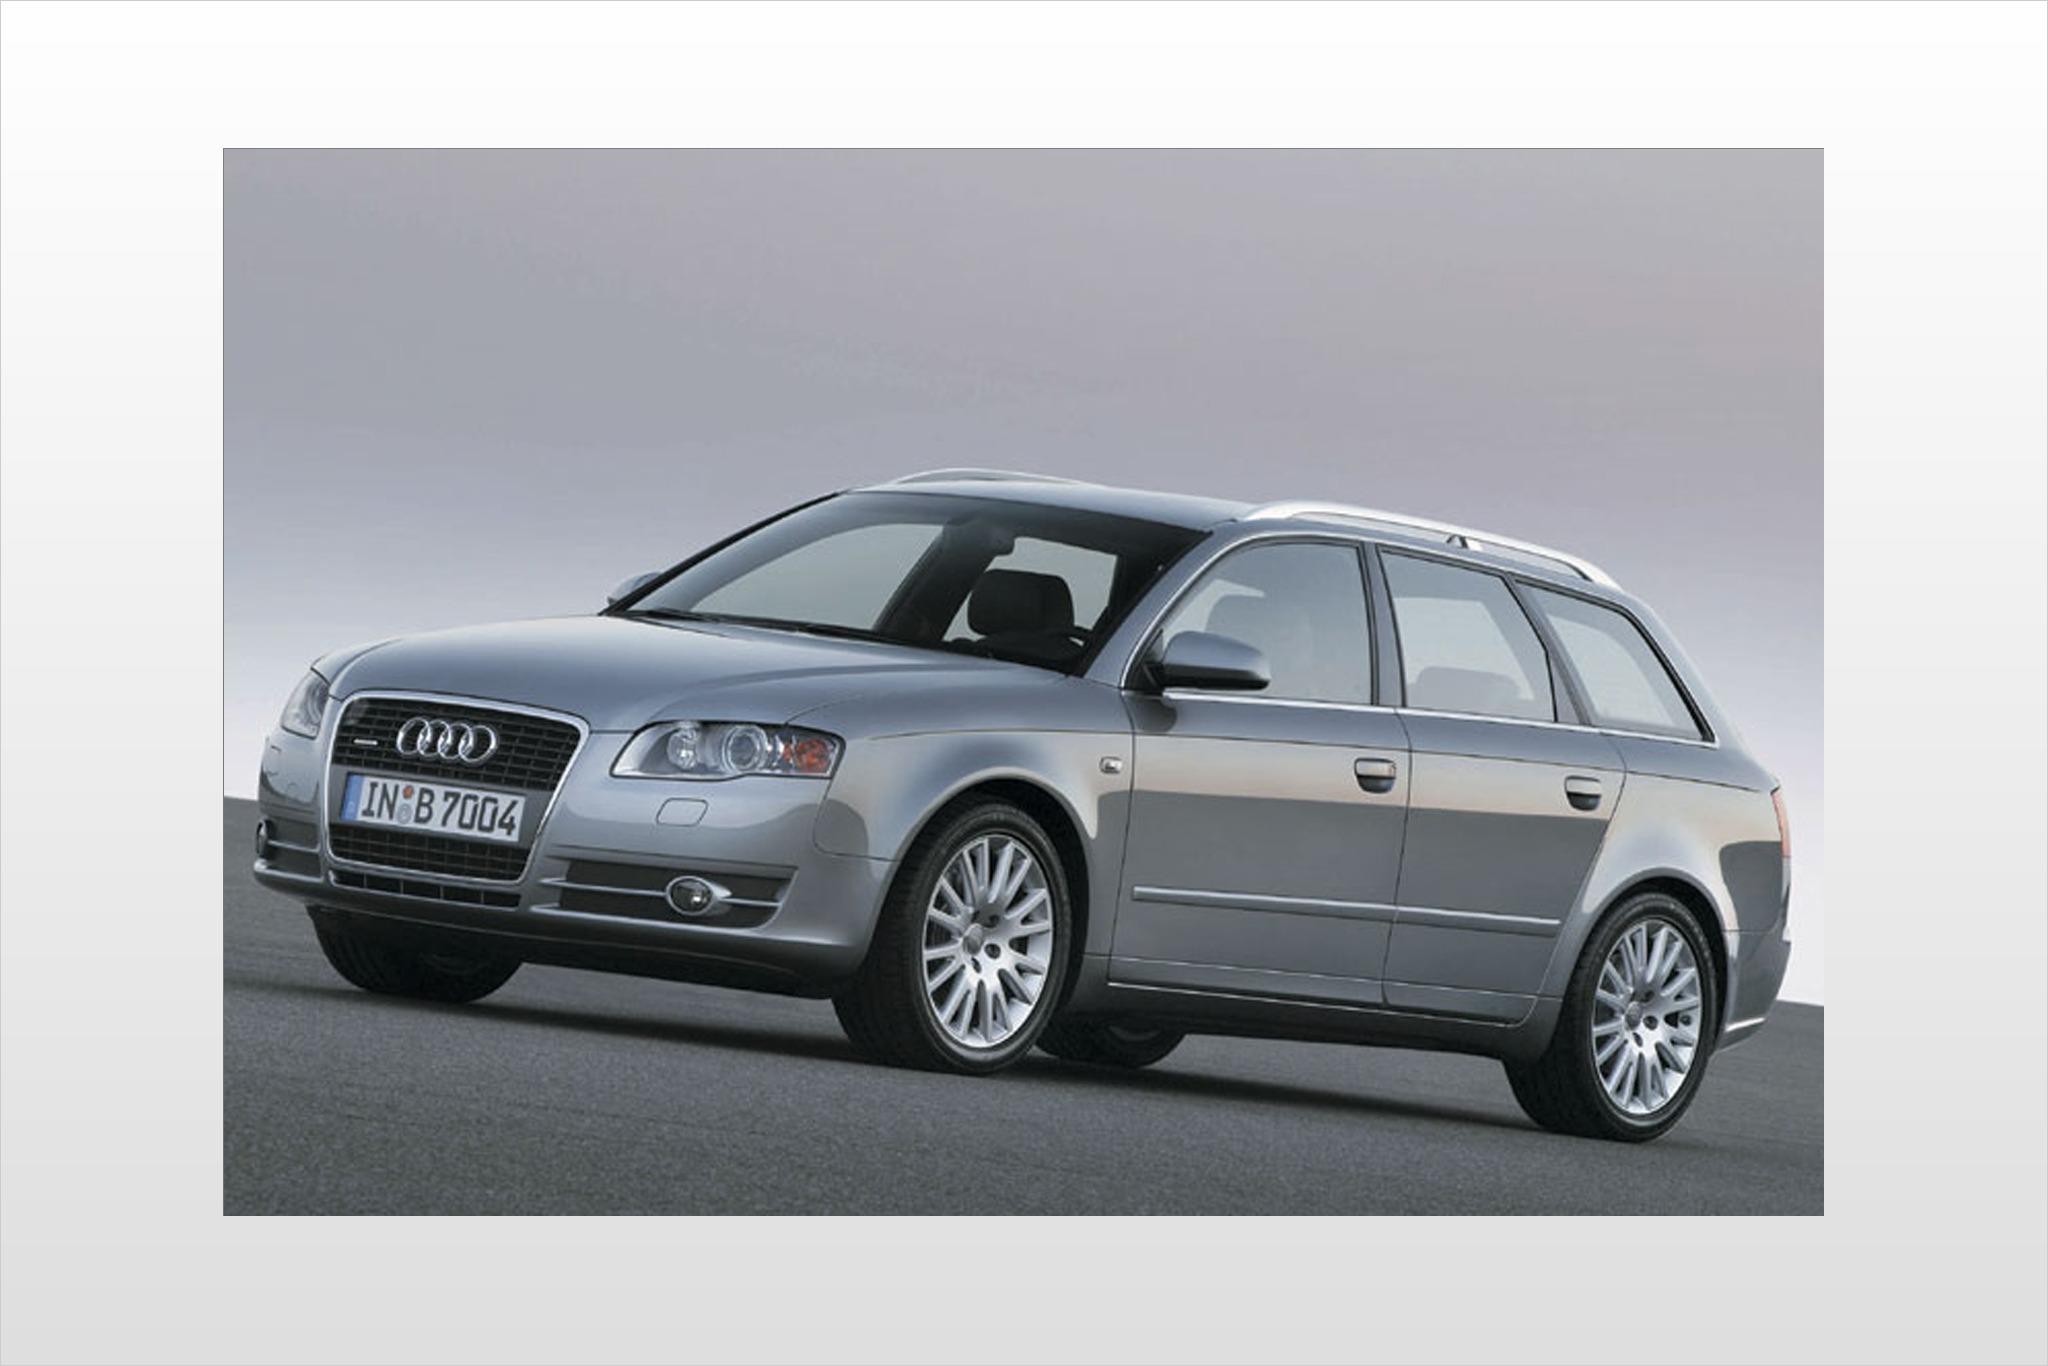 2008 Audi A4 Image 8